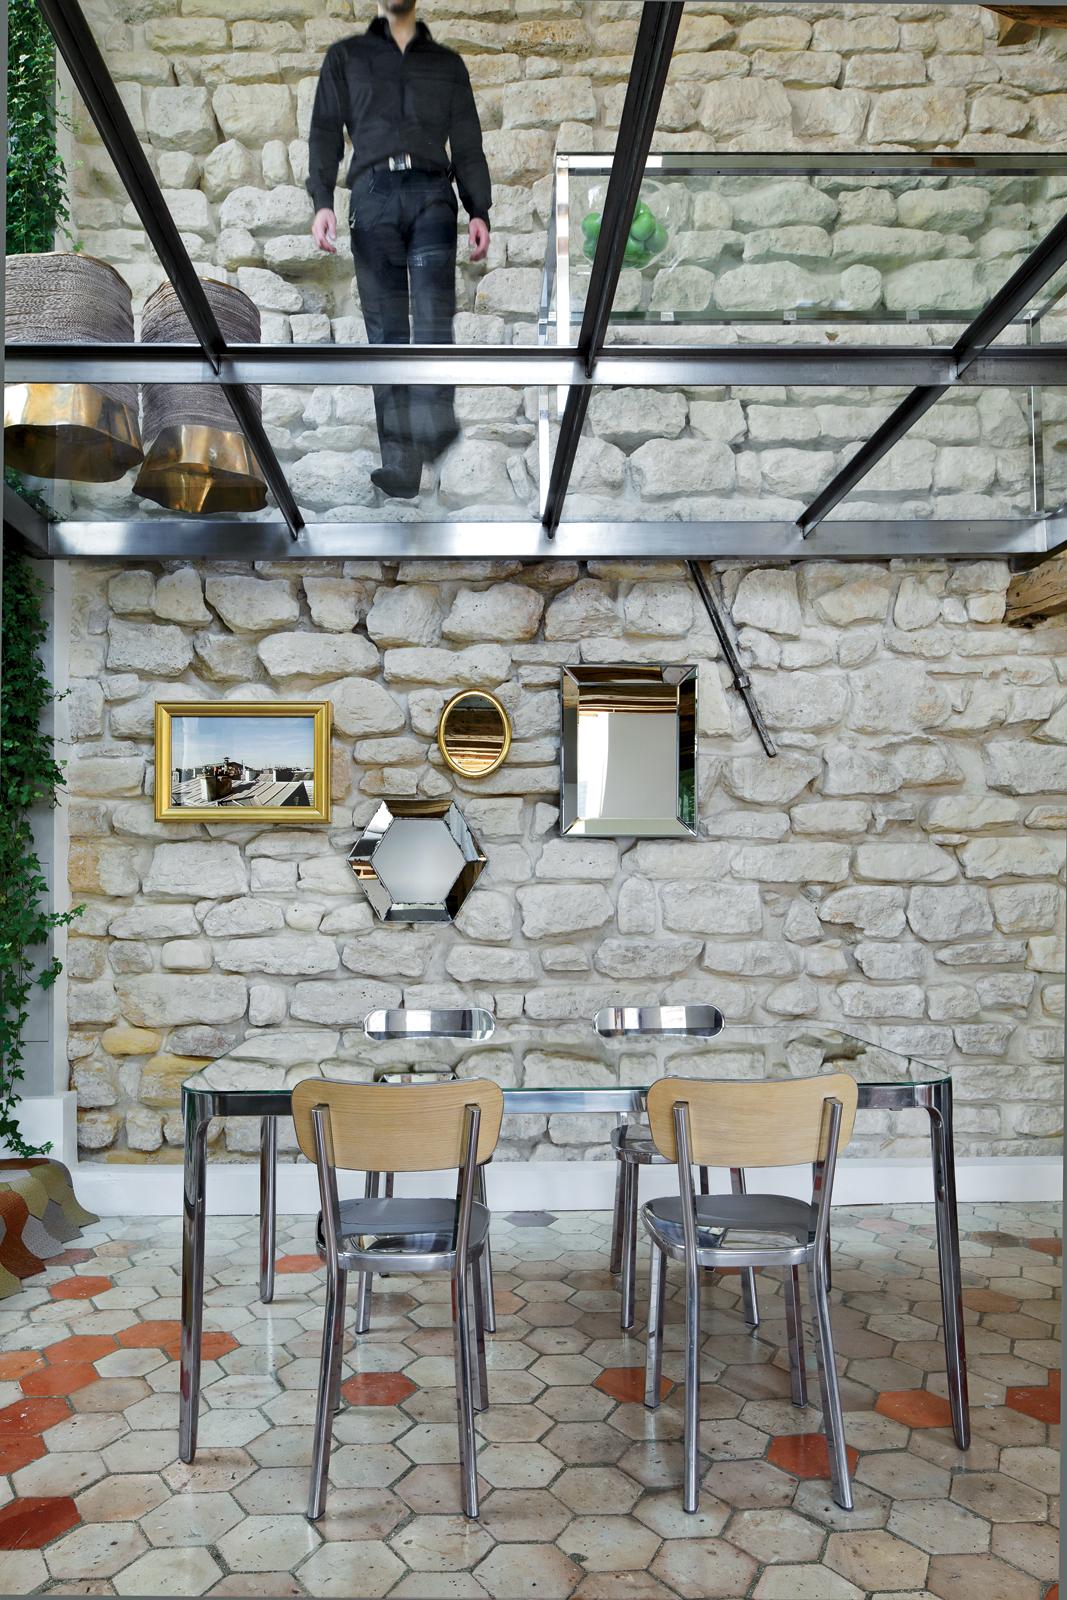 A-walk-on-the-sensational-glass-floor